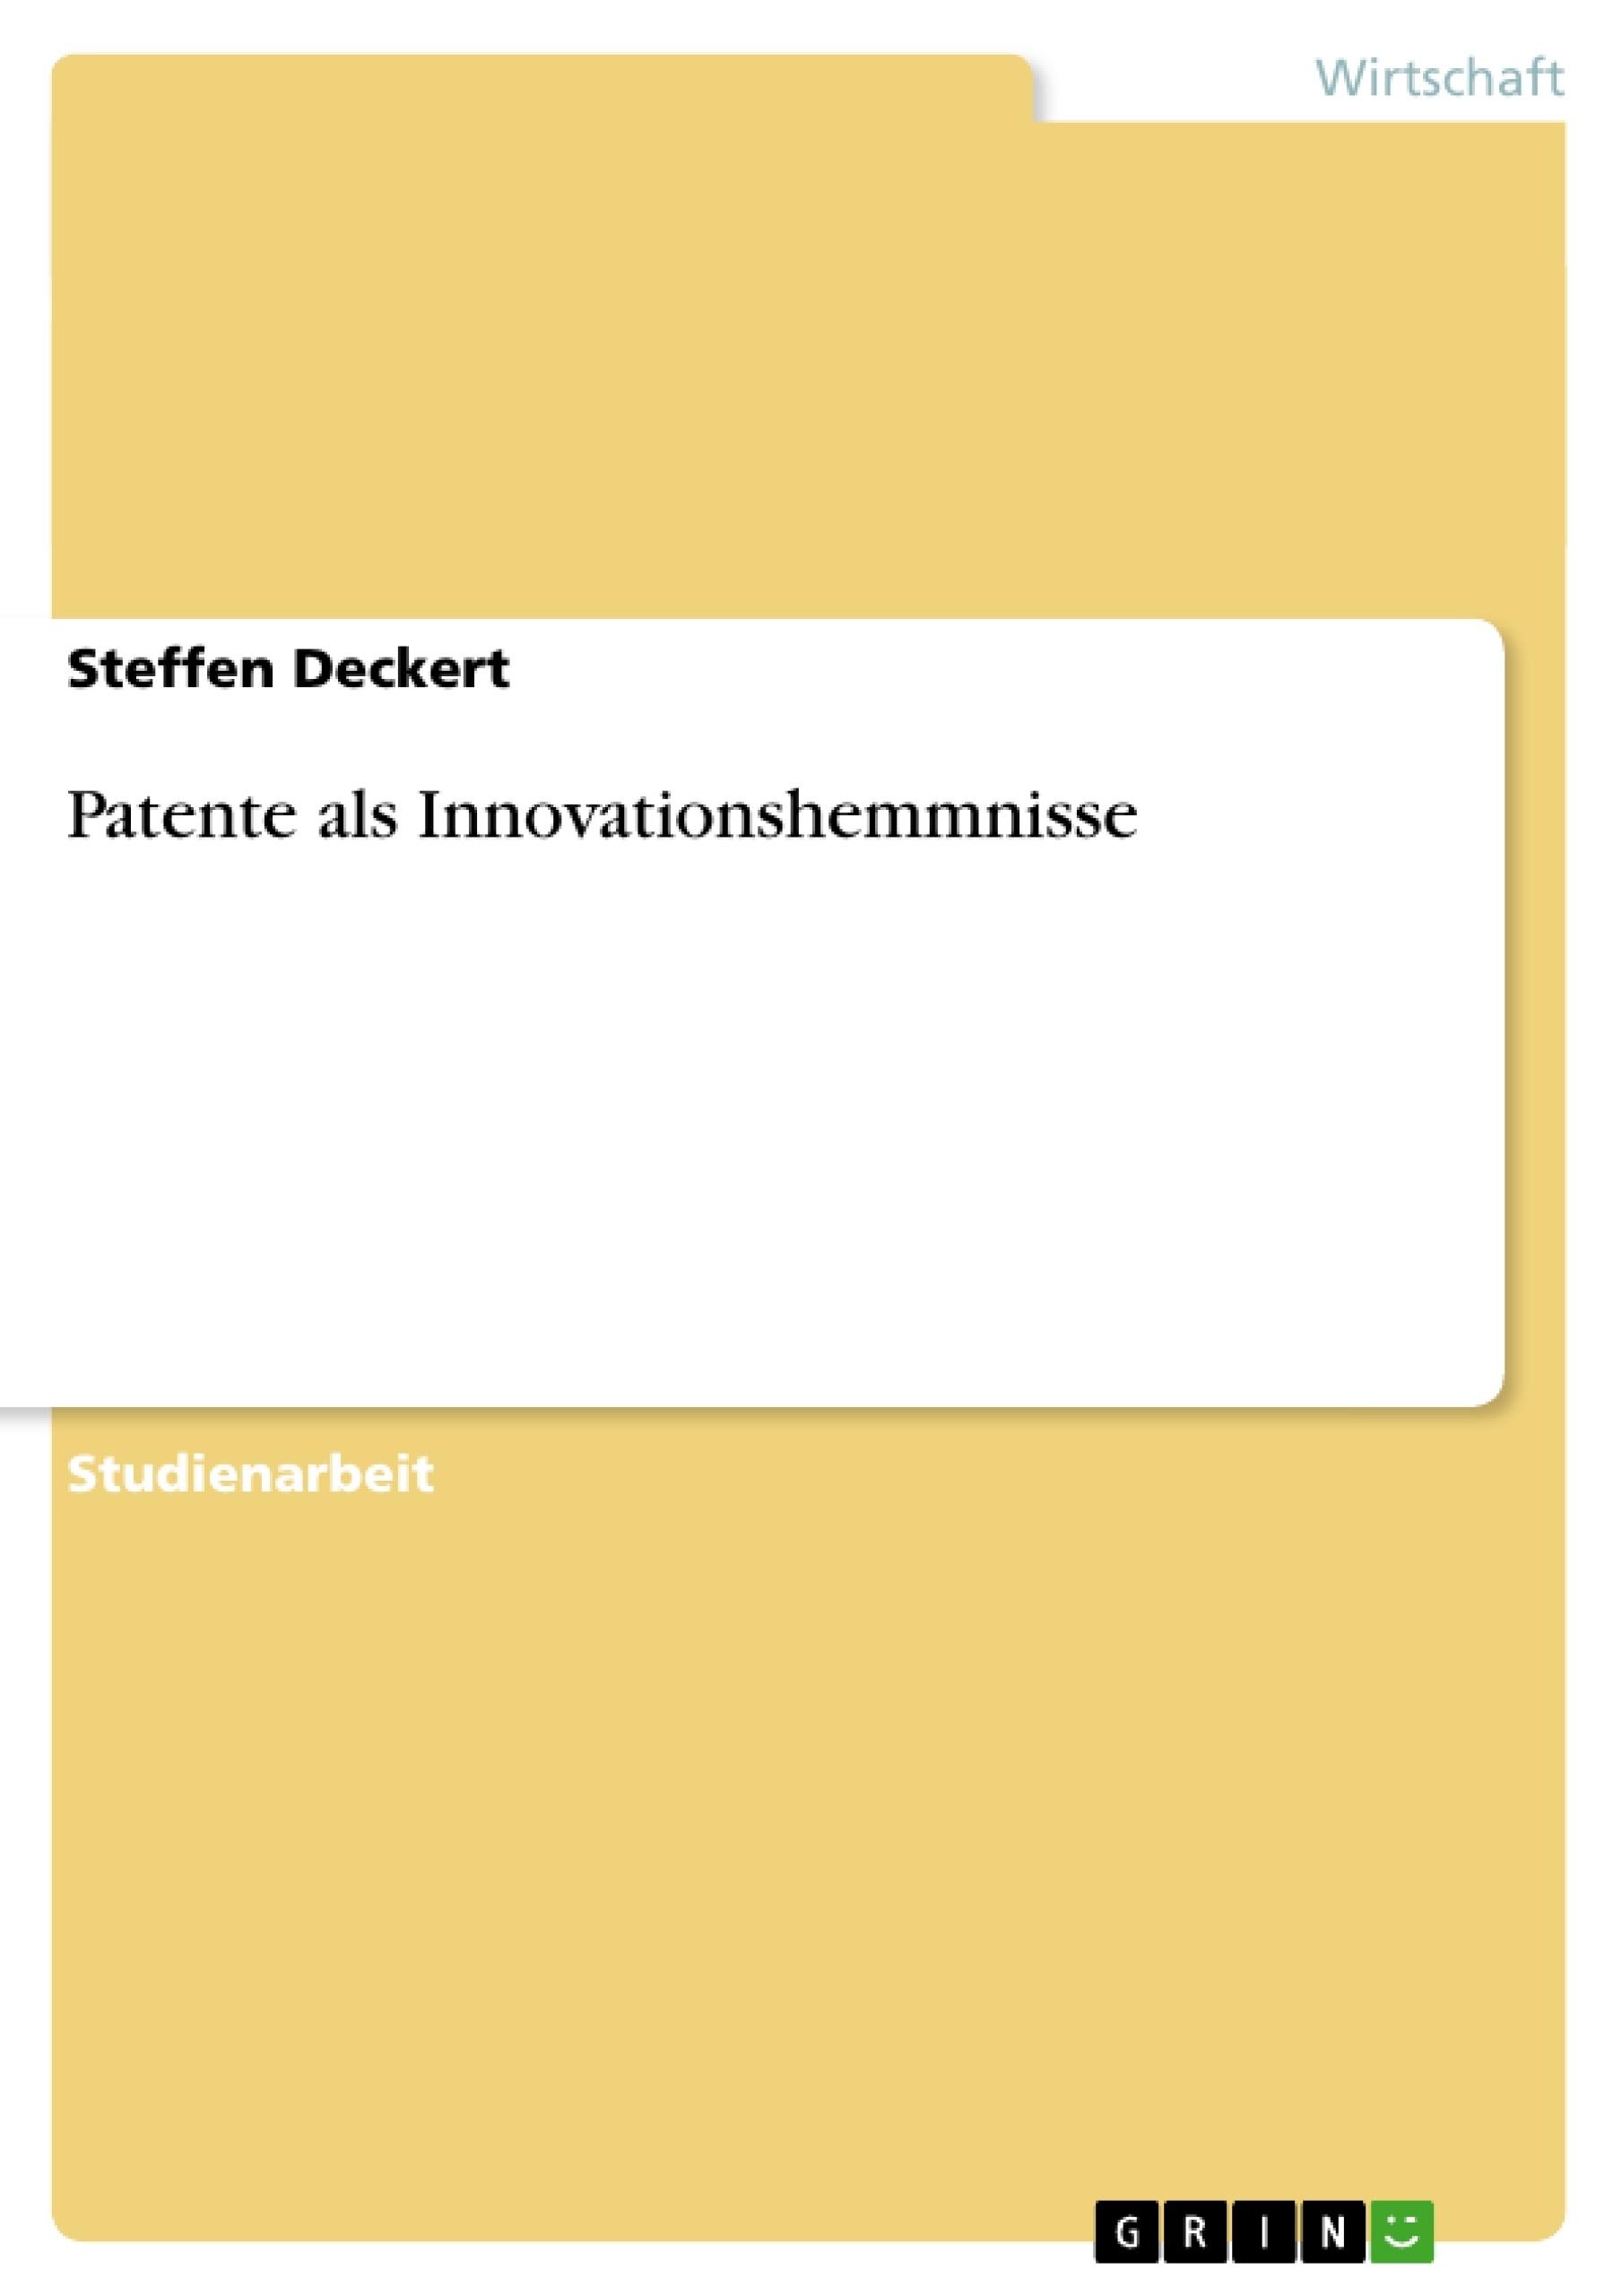 Titel: Patente als Innovationshemmnisse